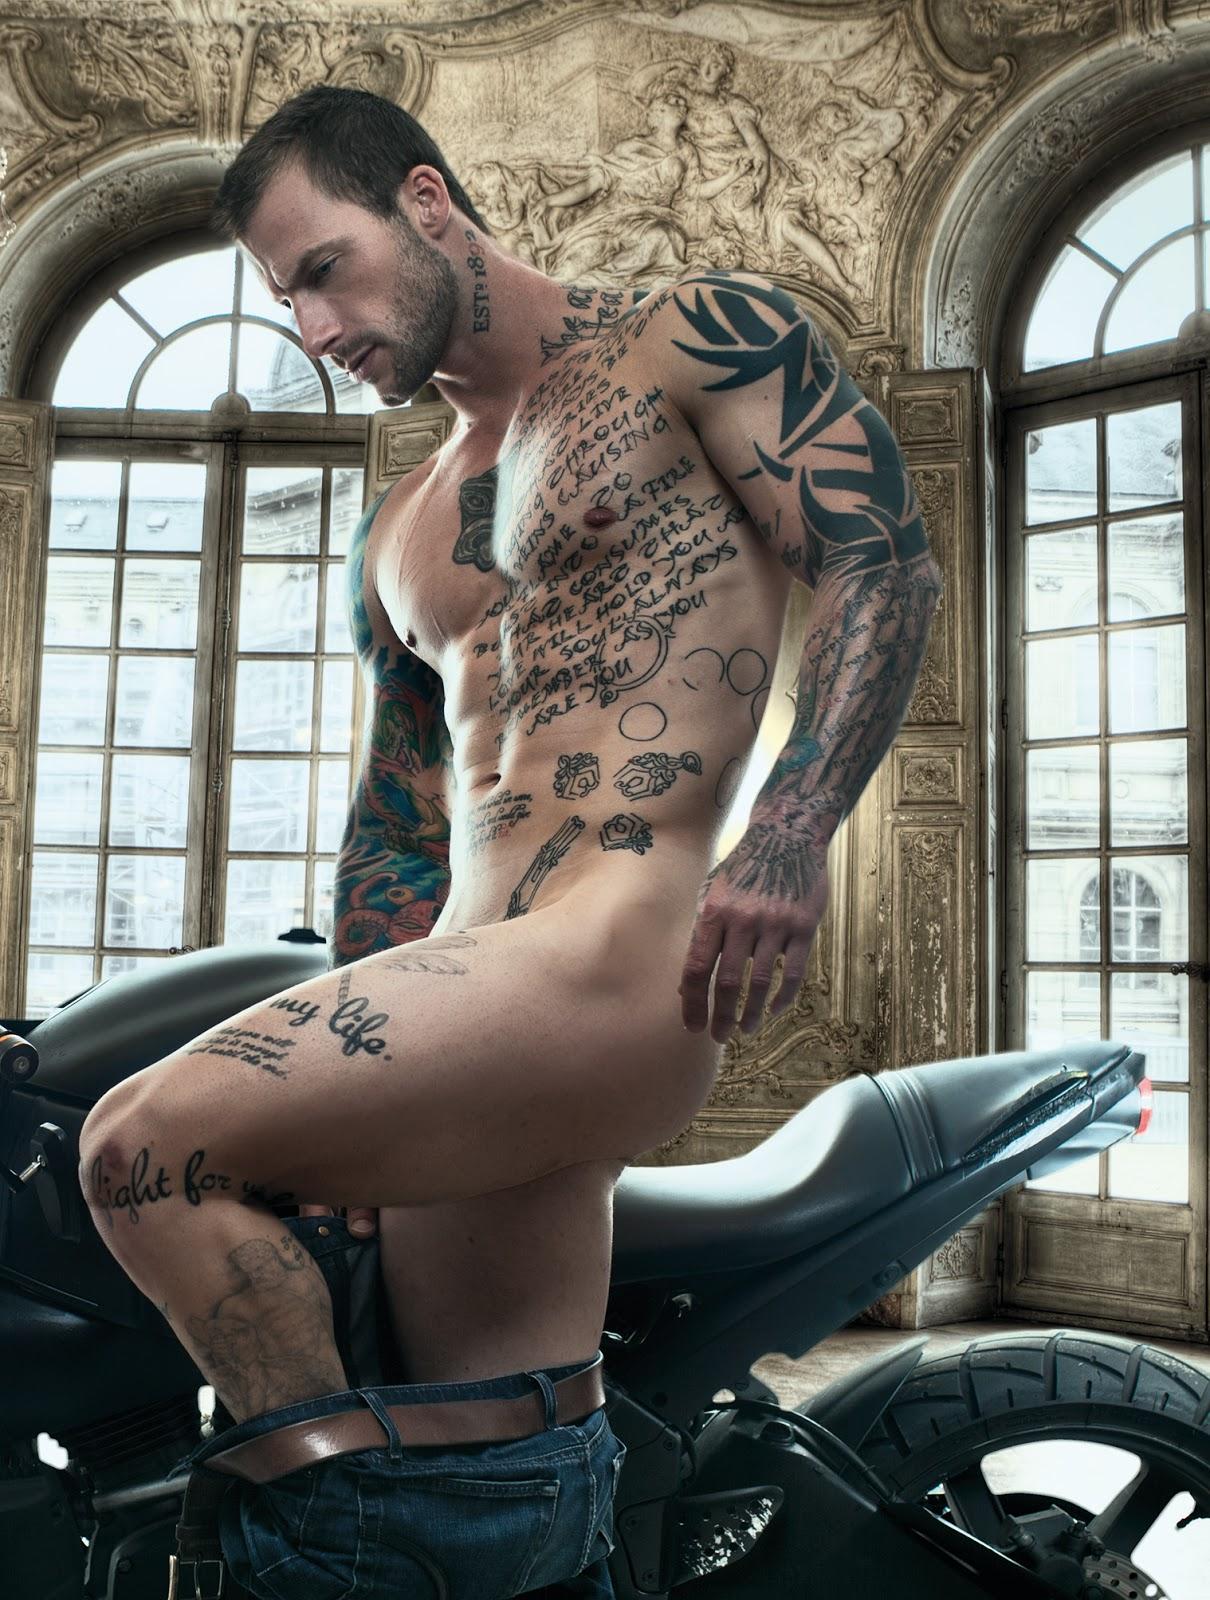 Dominant tattoo designs